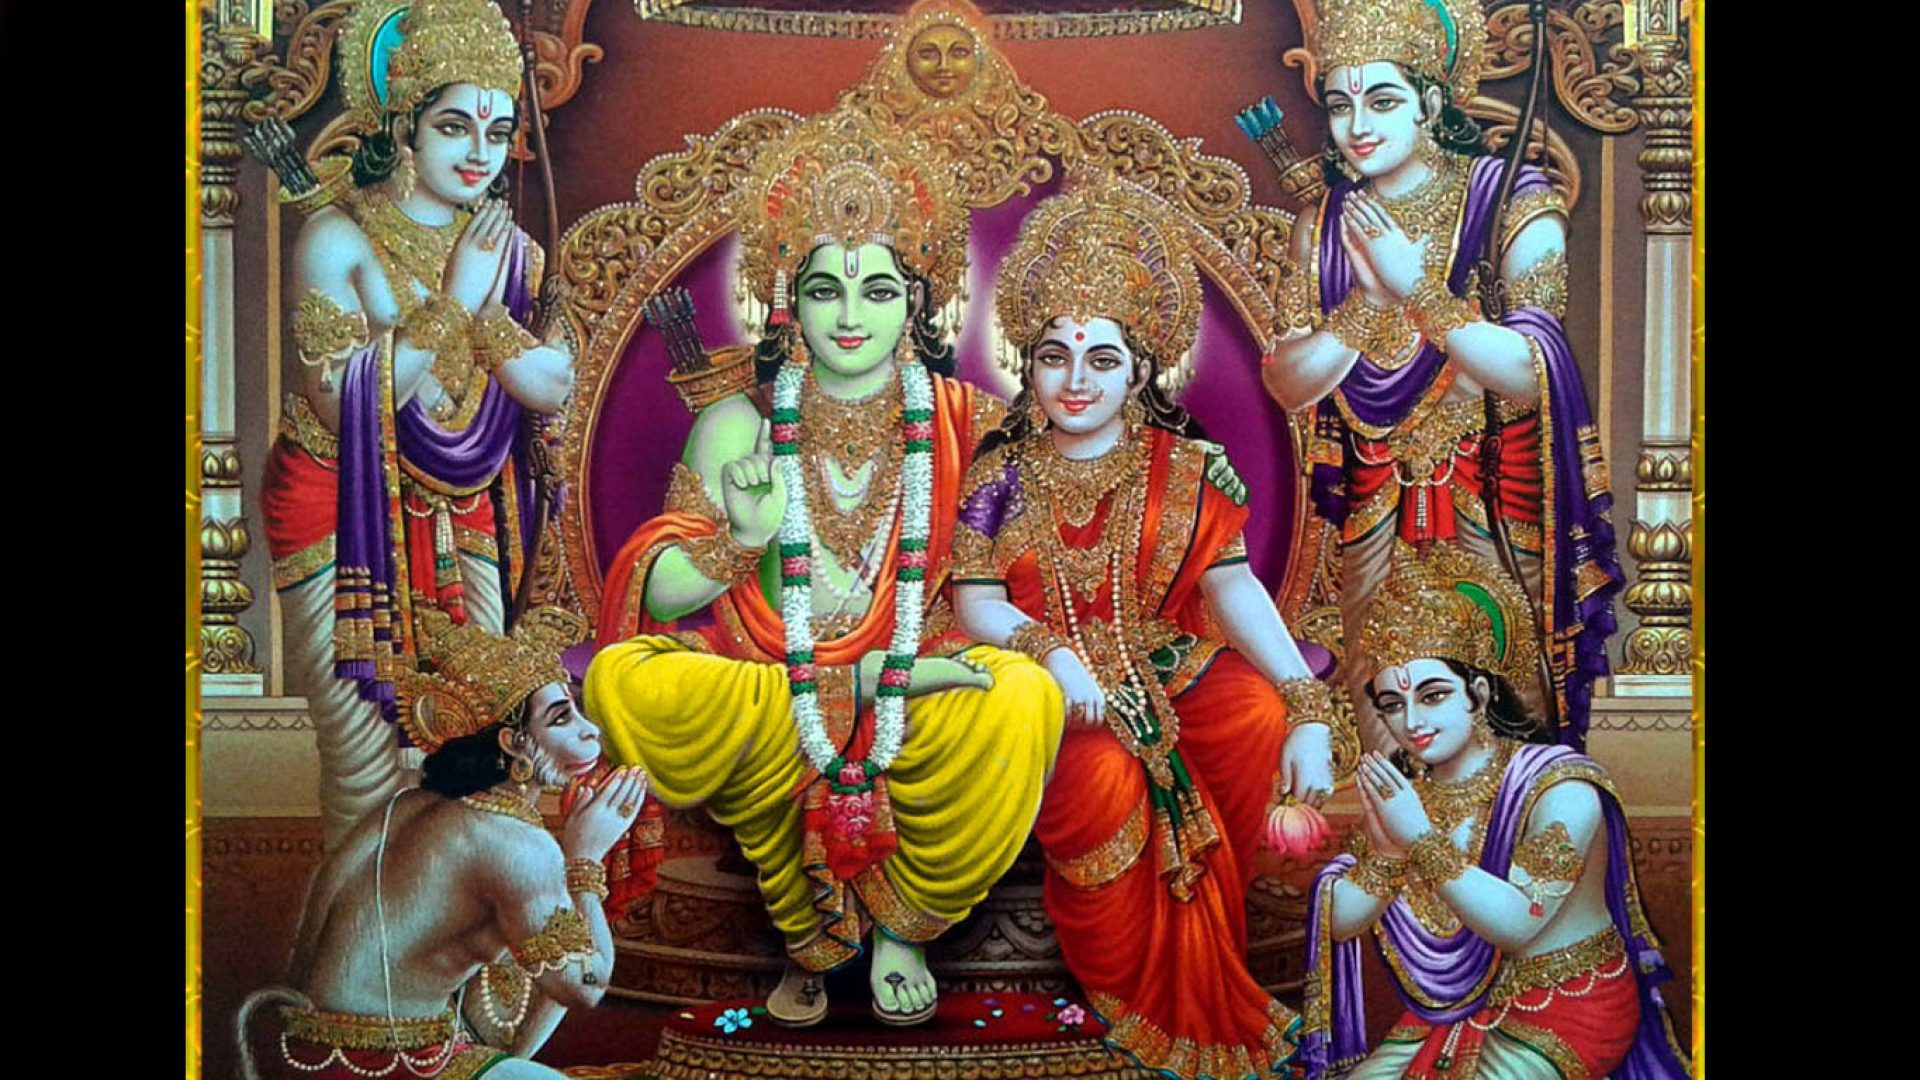 shri ram darbar image hd wallpaper hindu gods and goddesses shri ram darbar image hd wallpaper